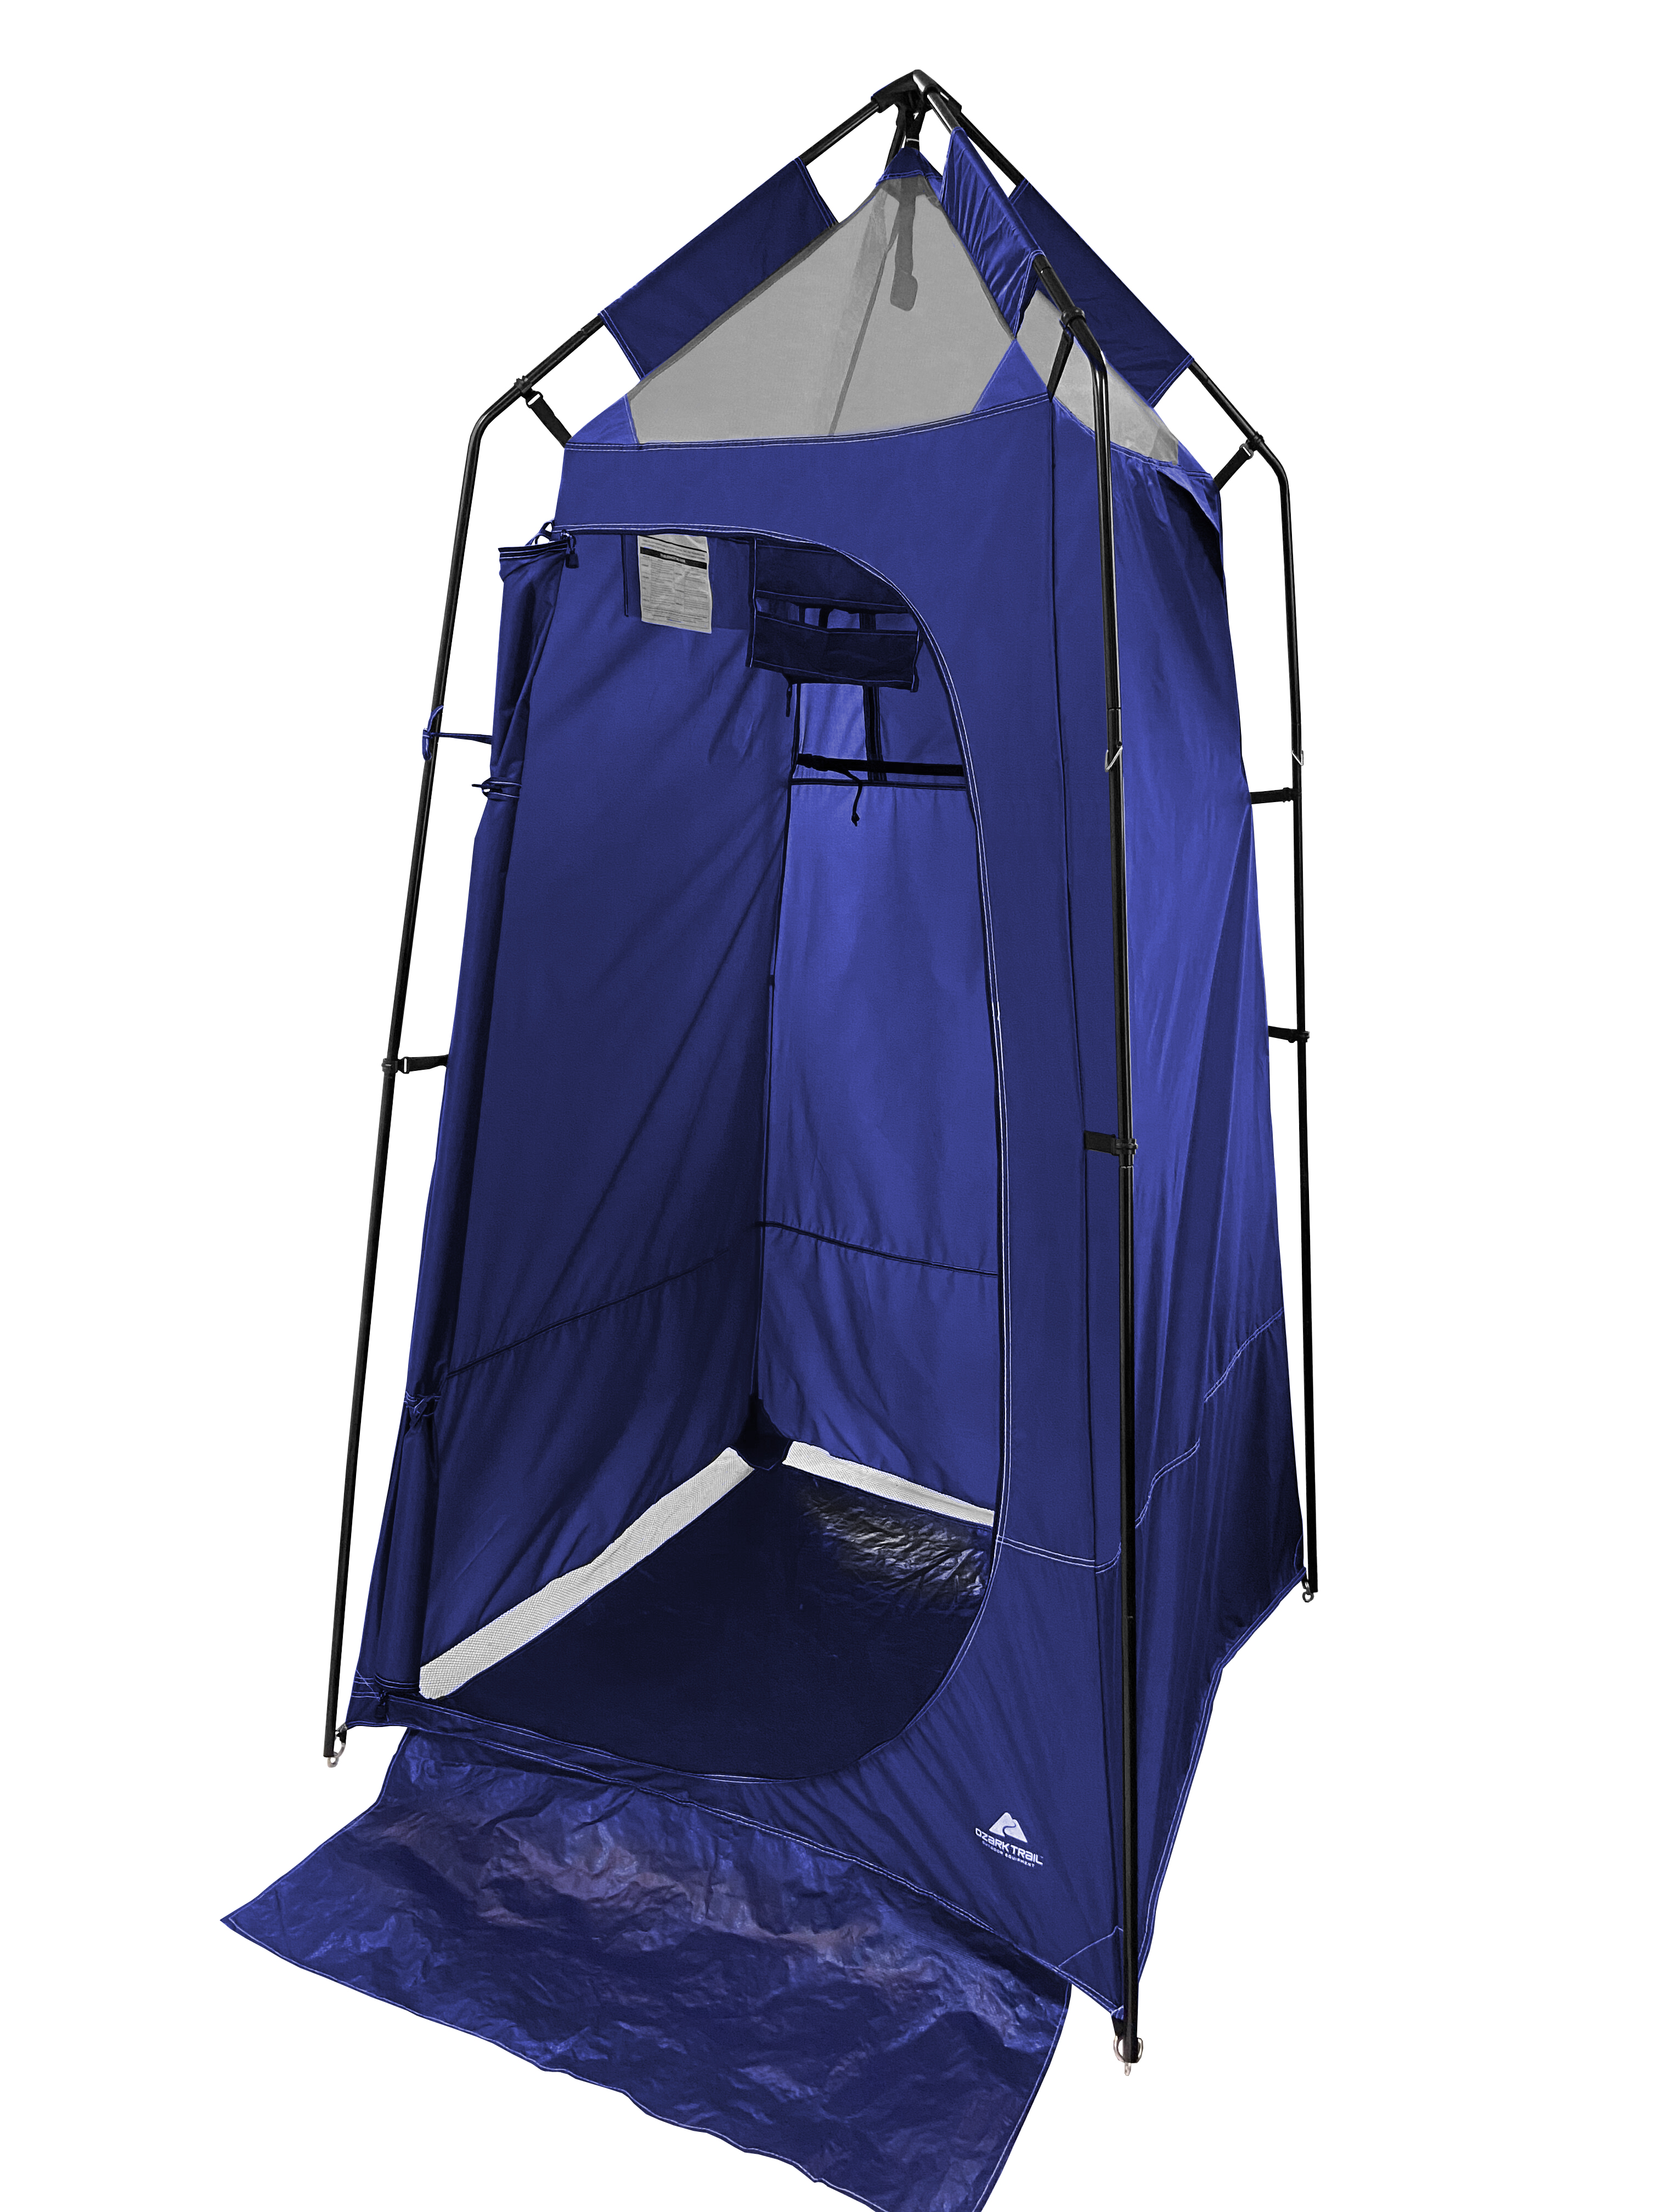 Ozark Trail Camping Shower And Utility Tent With Waterproof Bottom And Rain Guard Walmart Com Walmart Com